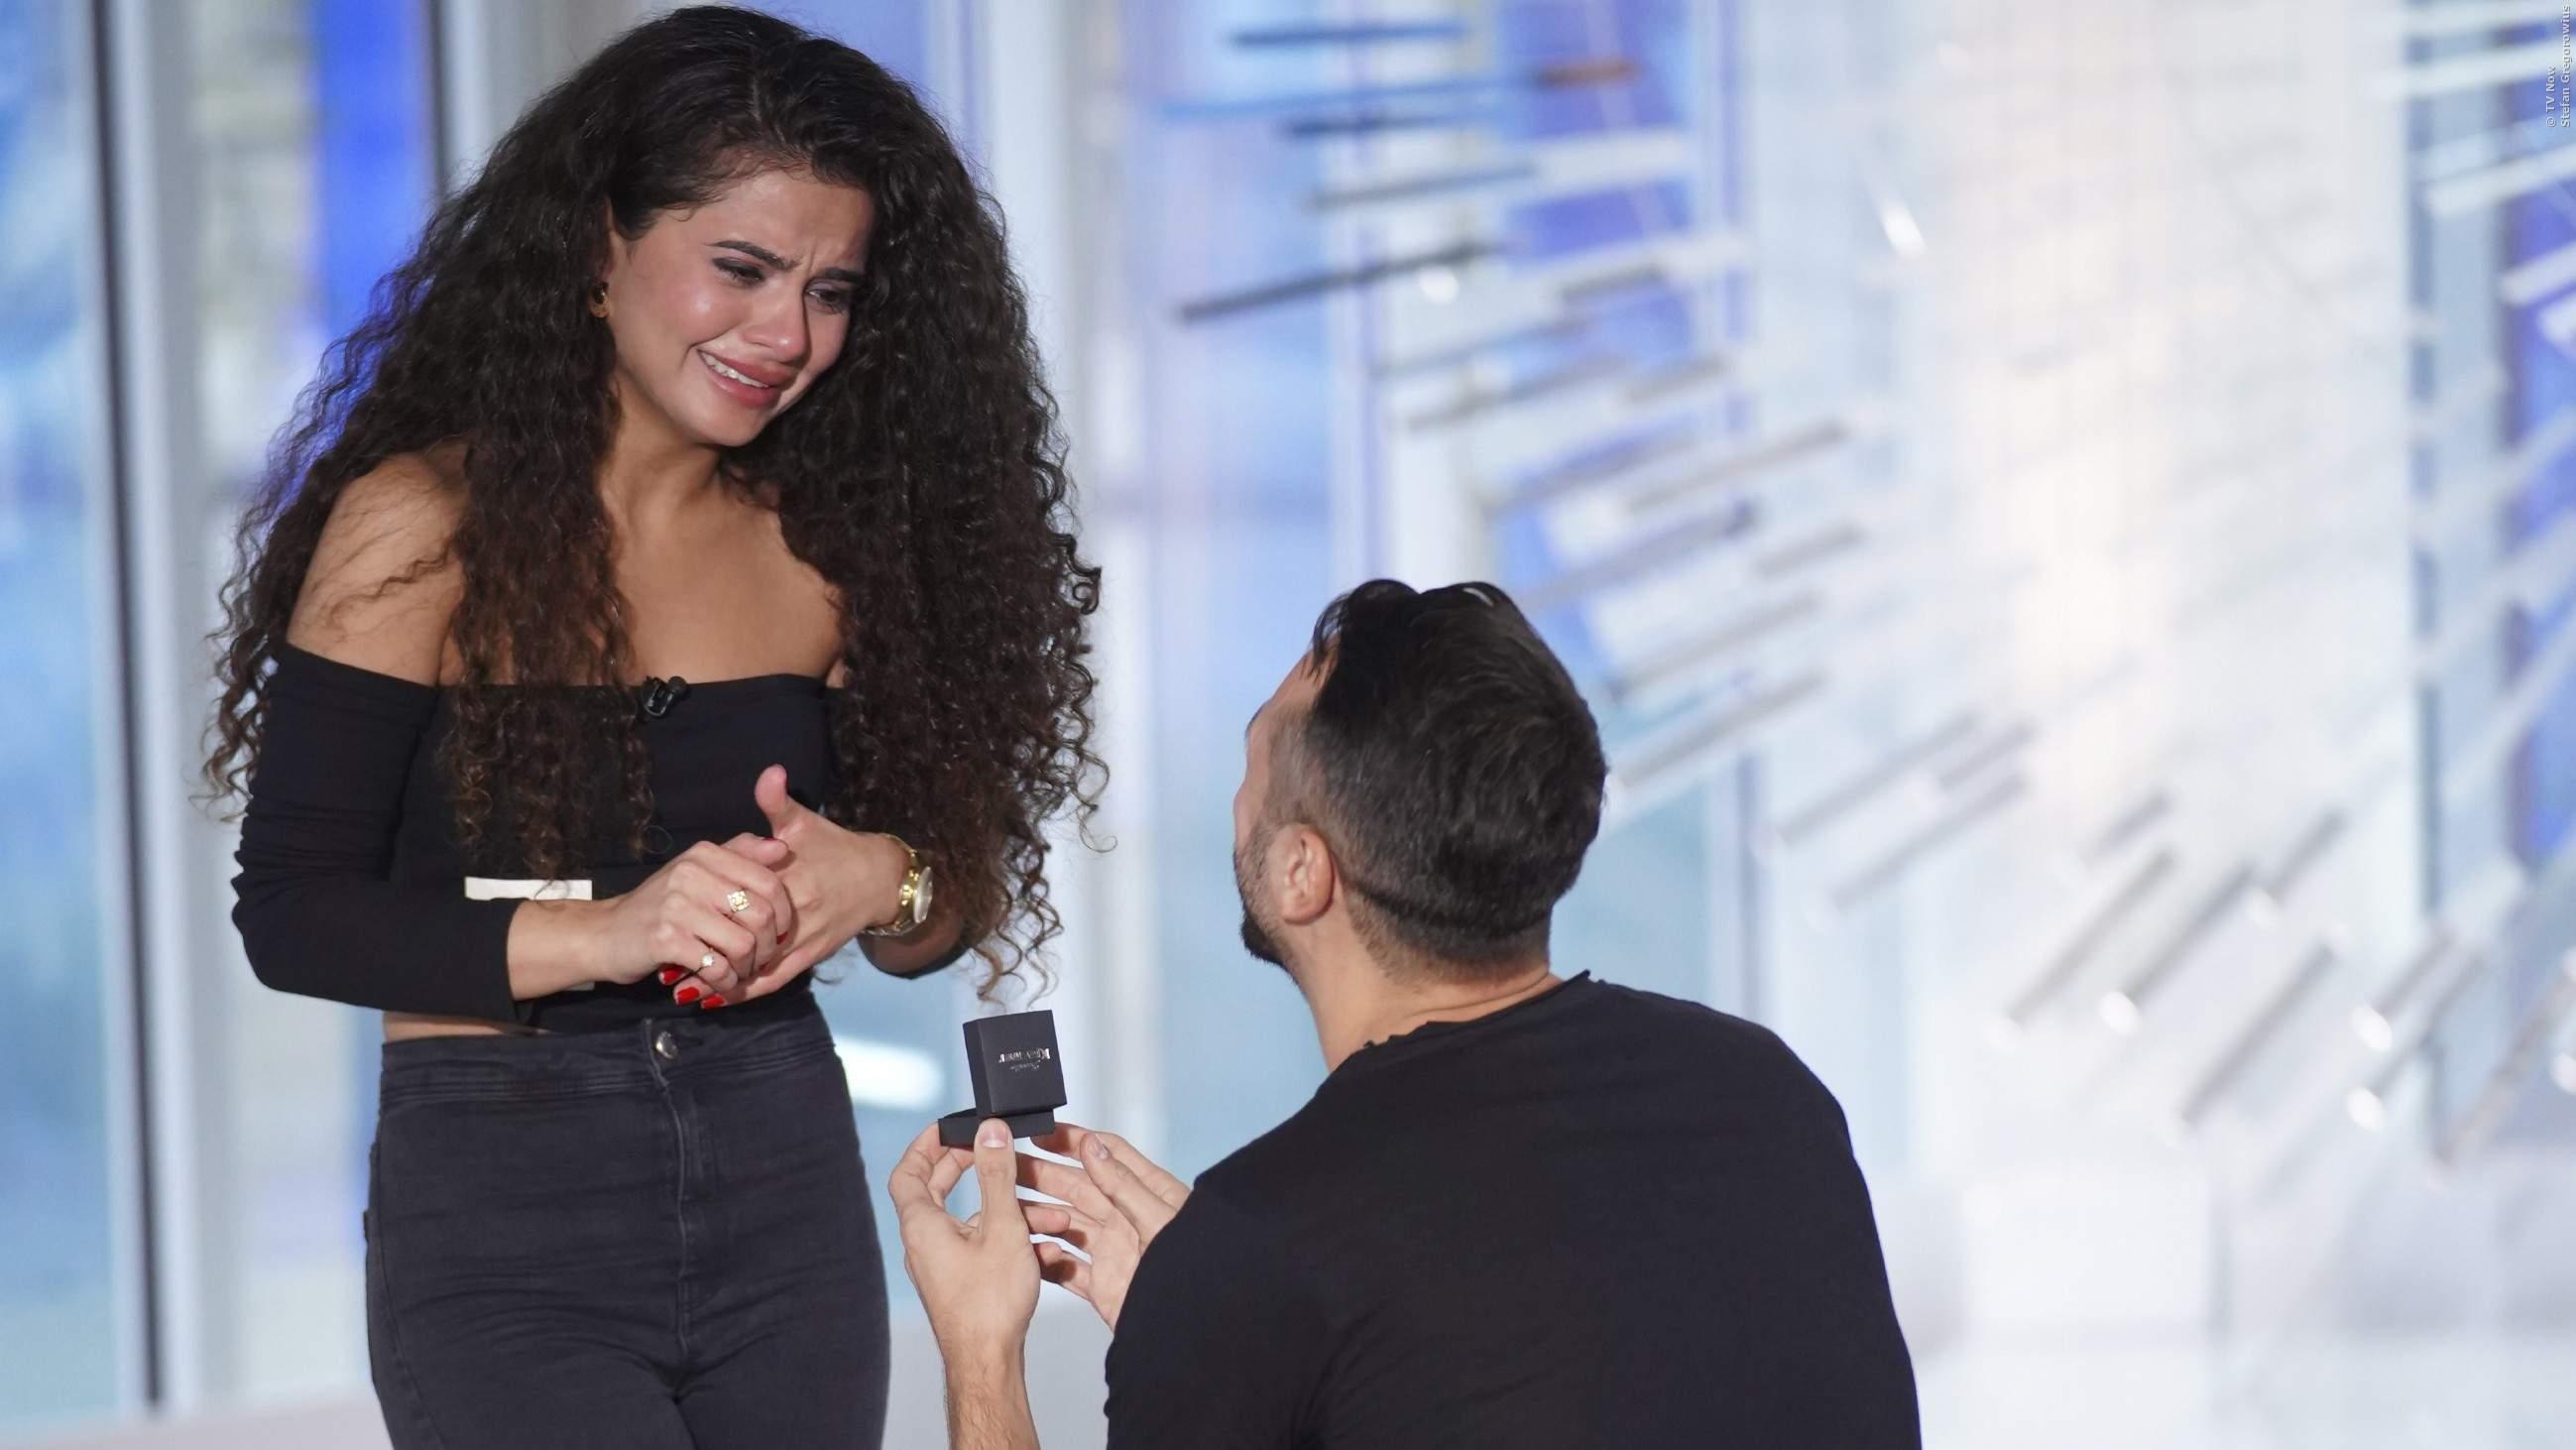 Der Heiratsantrag bei DSDS